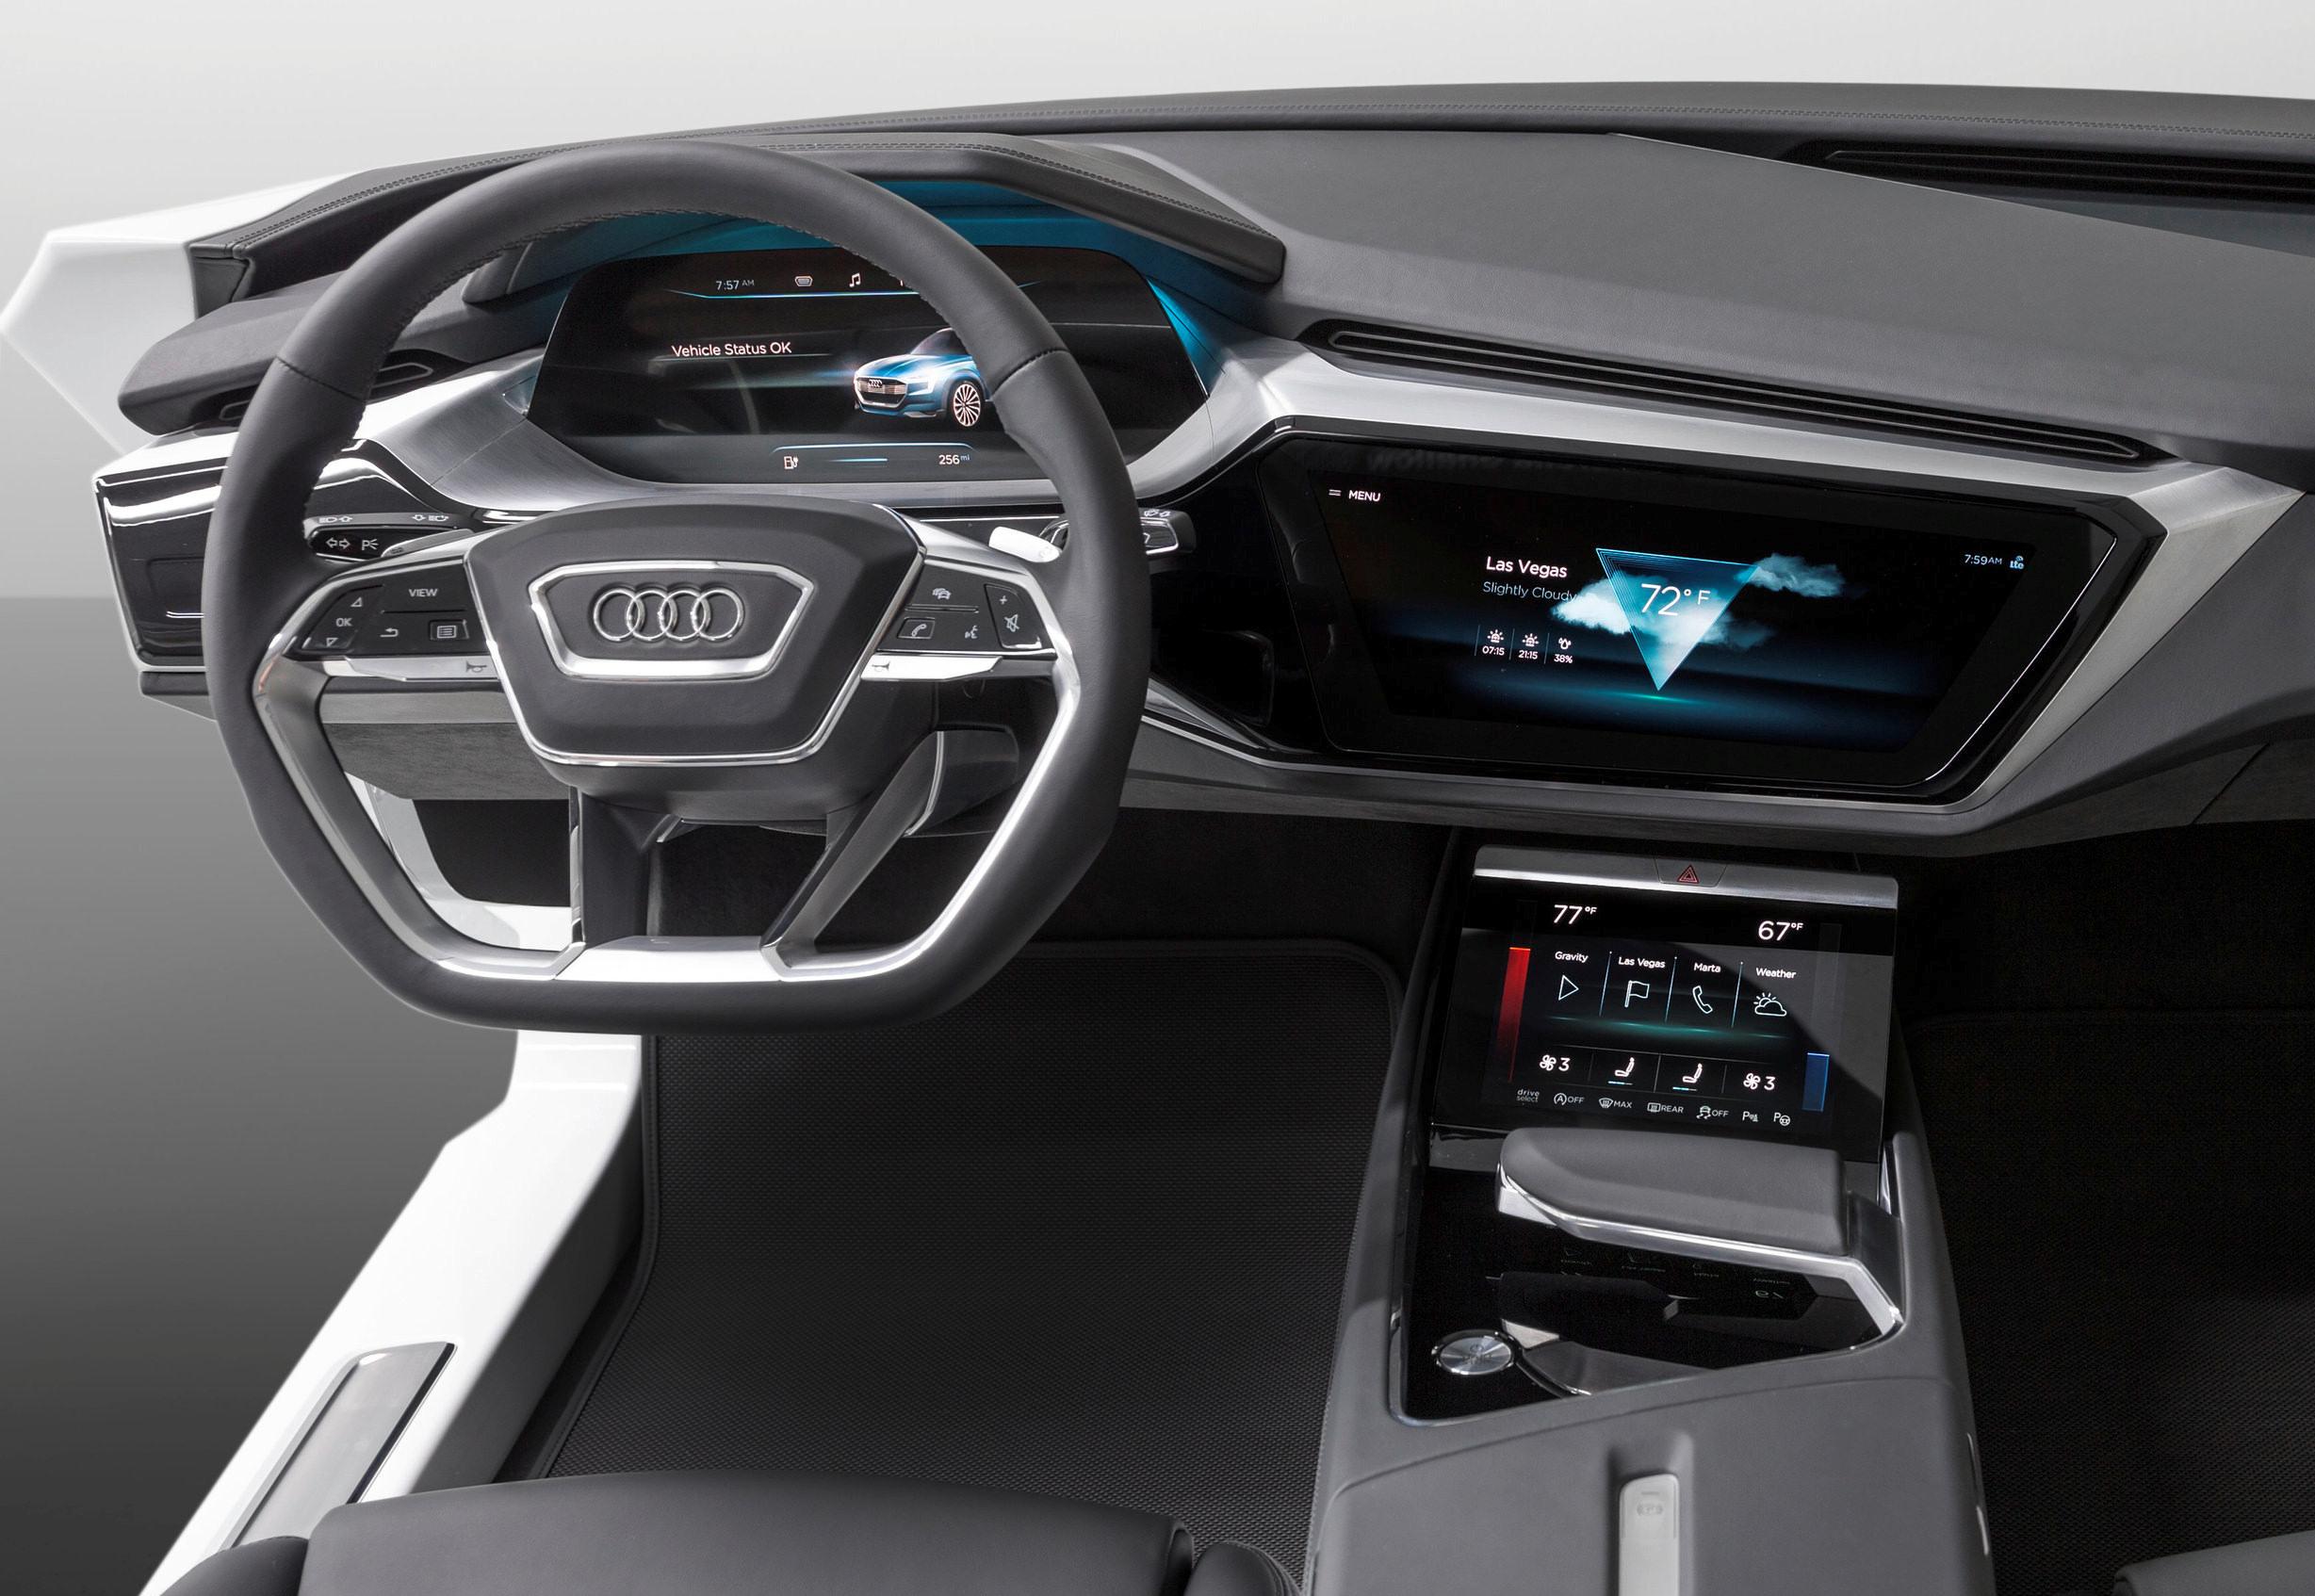 Neues Virtual Cockpit Von Audi Pocketnavigation De